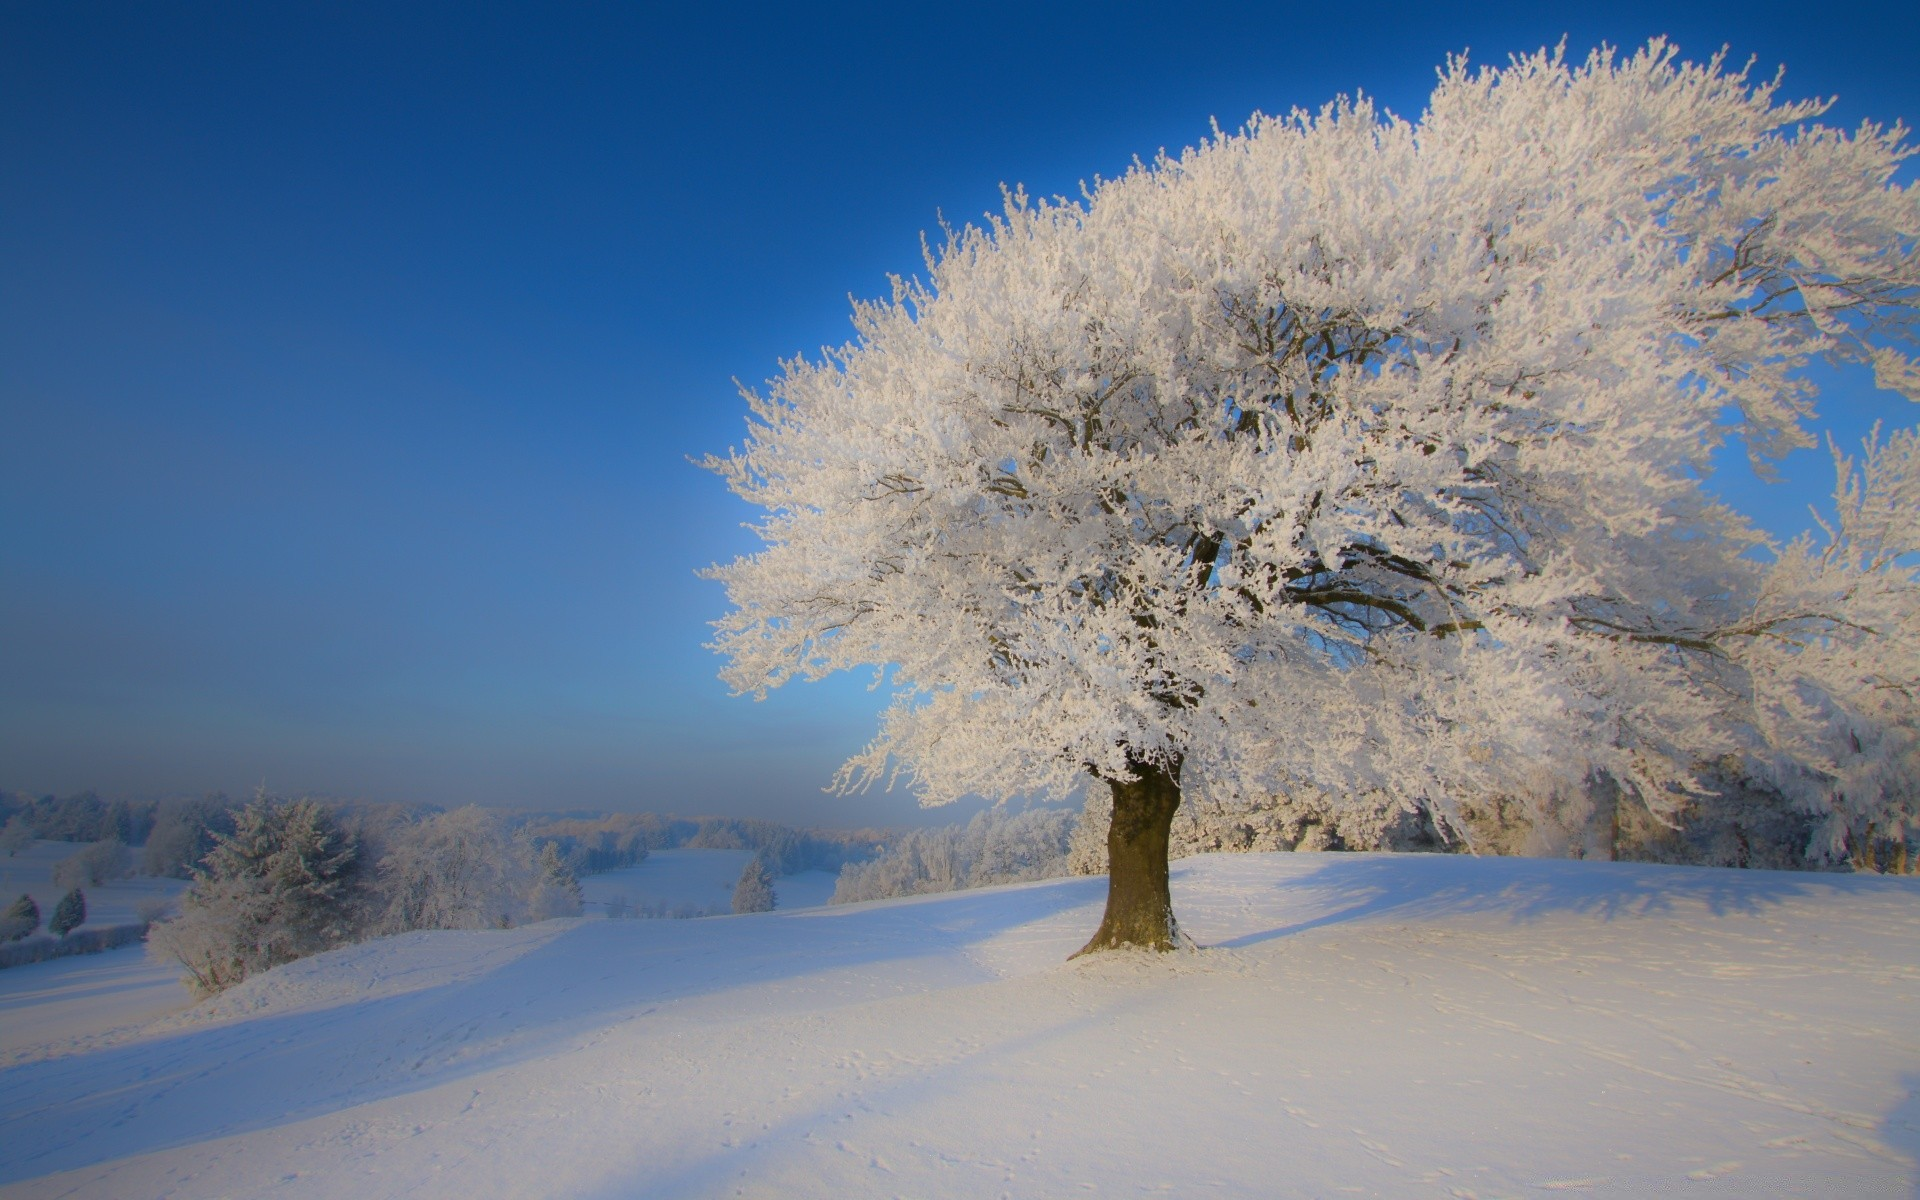 Beautiful Winter Landscape - Phone wallpapers